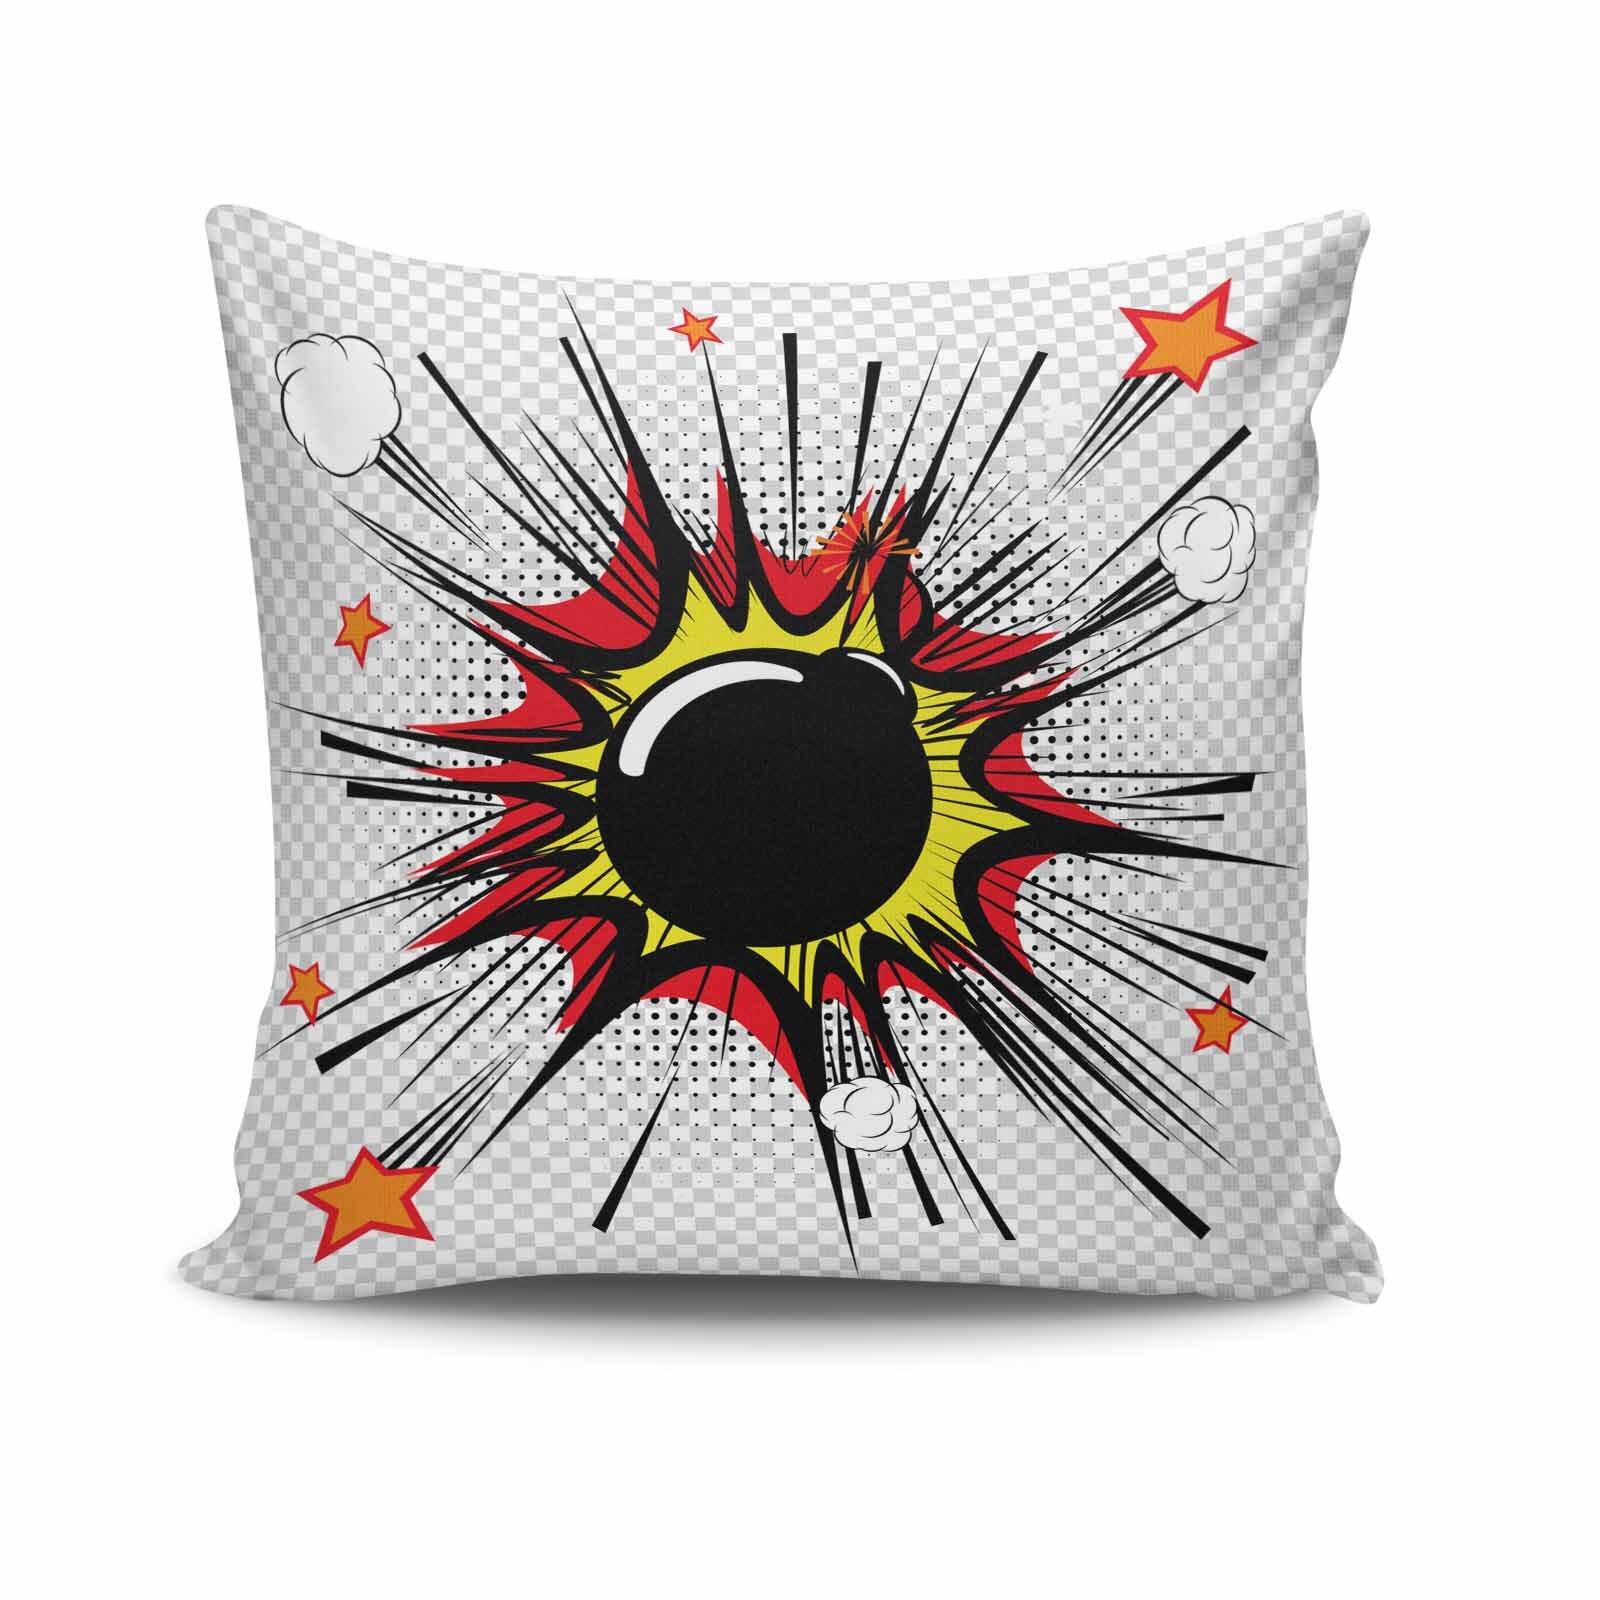 Perna decorativa Kissy, Dimensiune: 45 x 45 cm, Material exterior: 50% bumbac / 50% poliester 422KSY0155